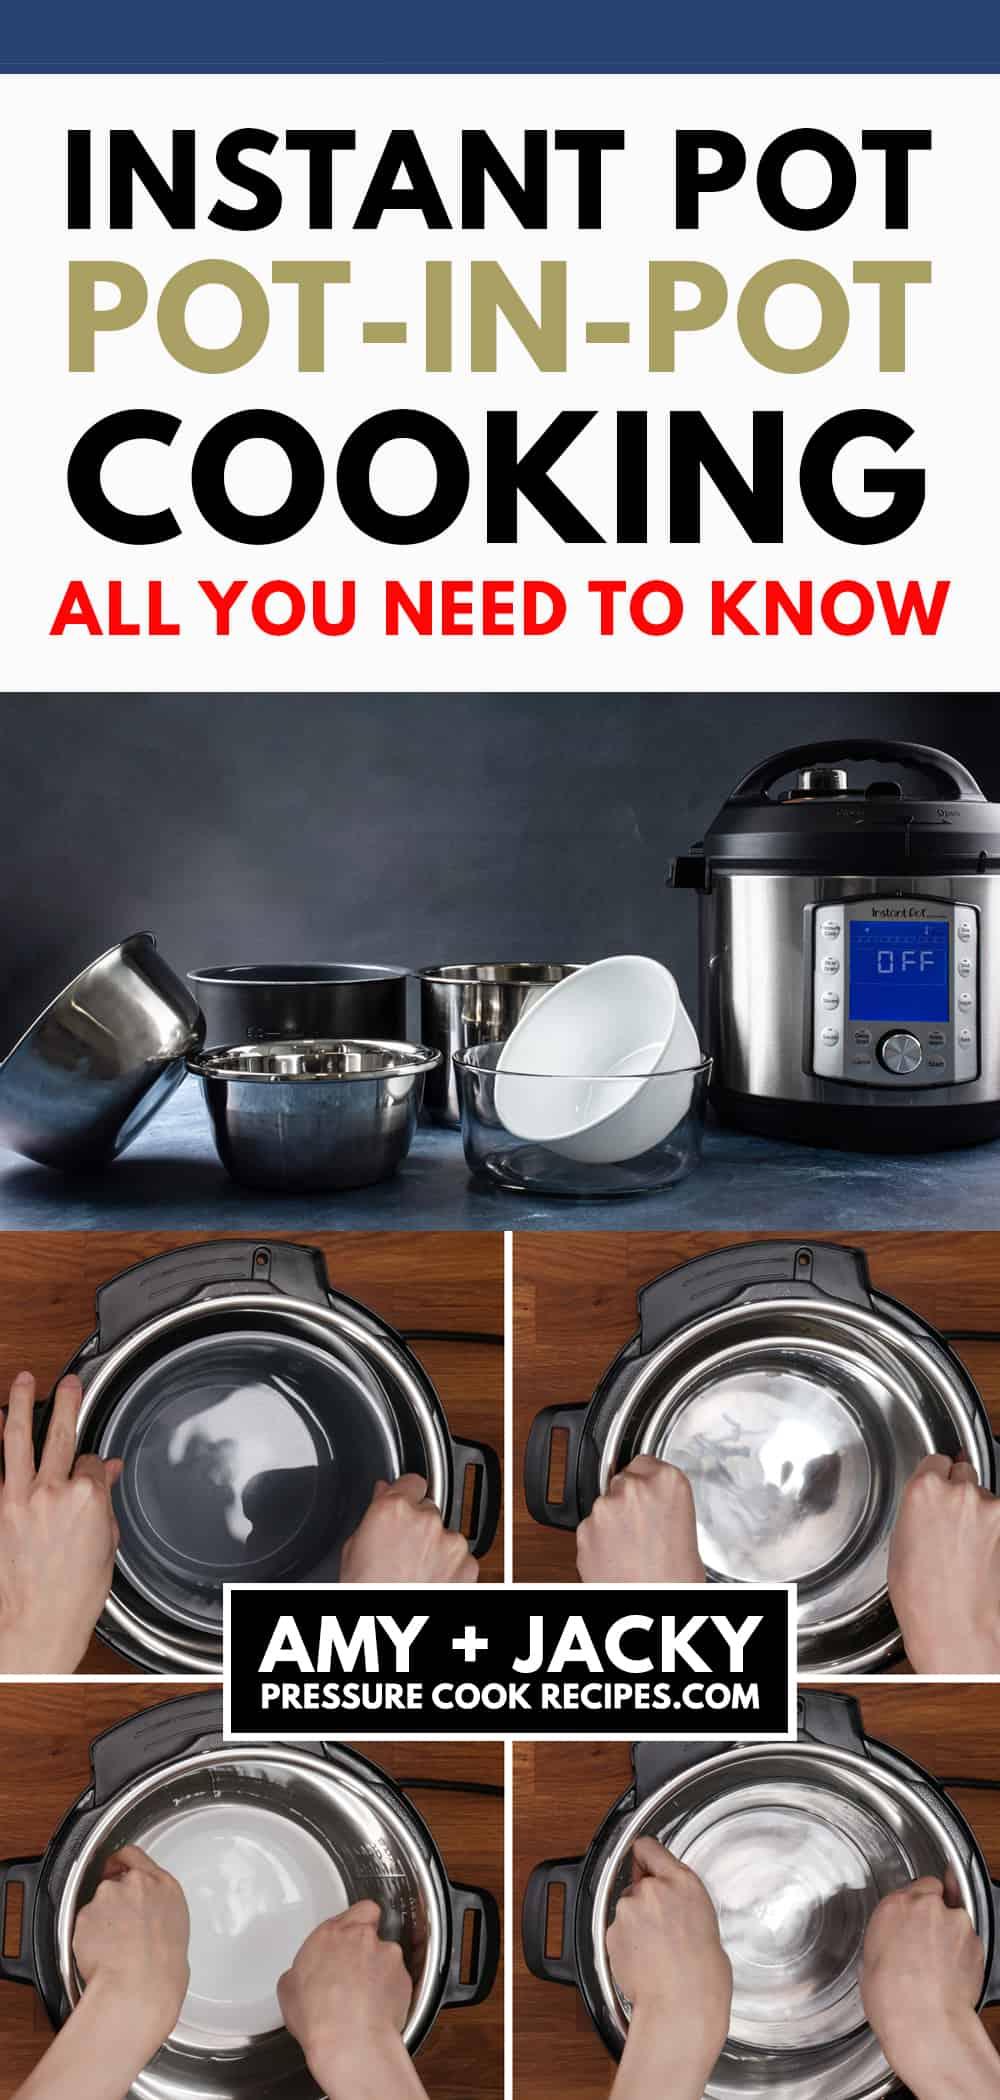 pot in pot instant pot | instant pot pot in pot | pot in pot instant pot recipes | pot in pot cooking